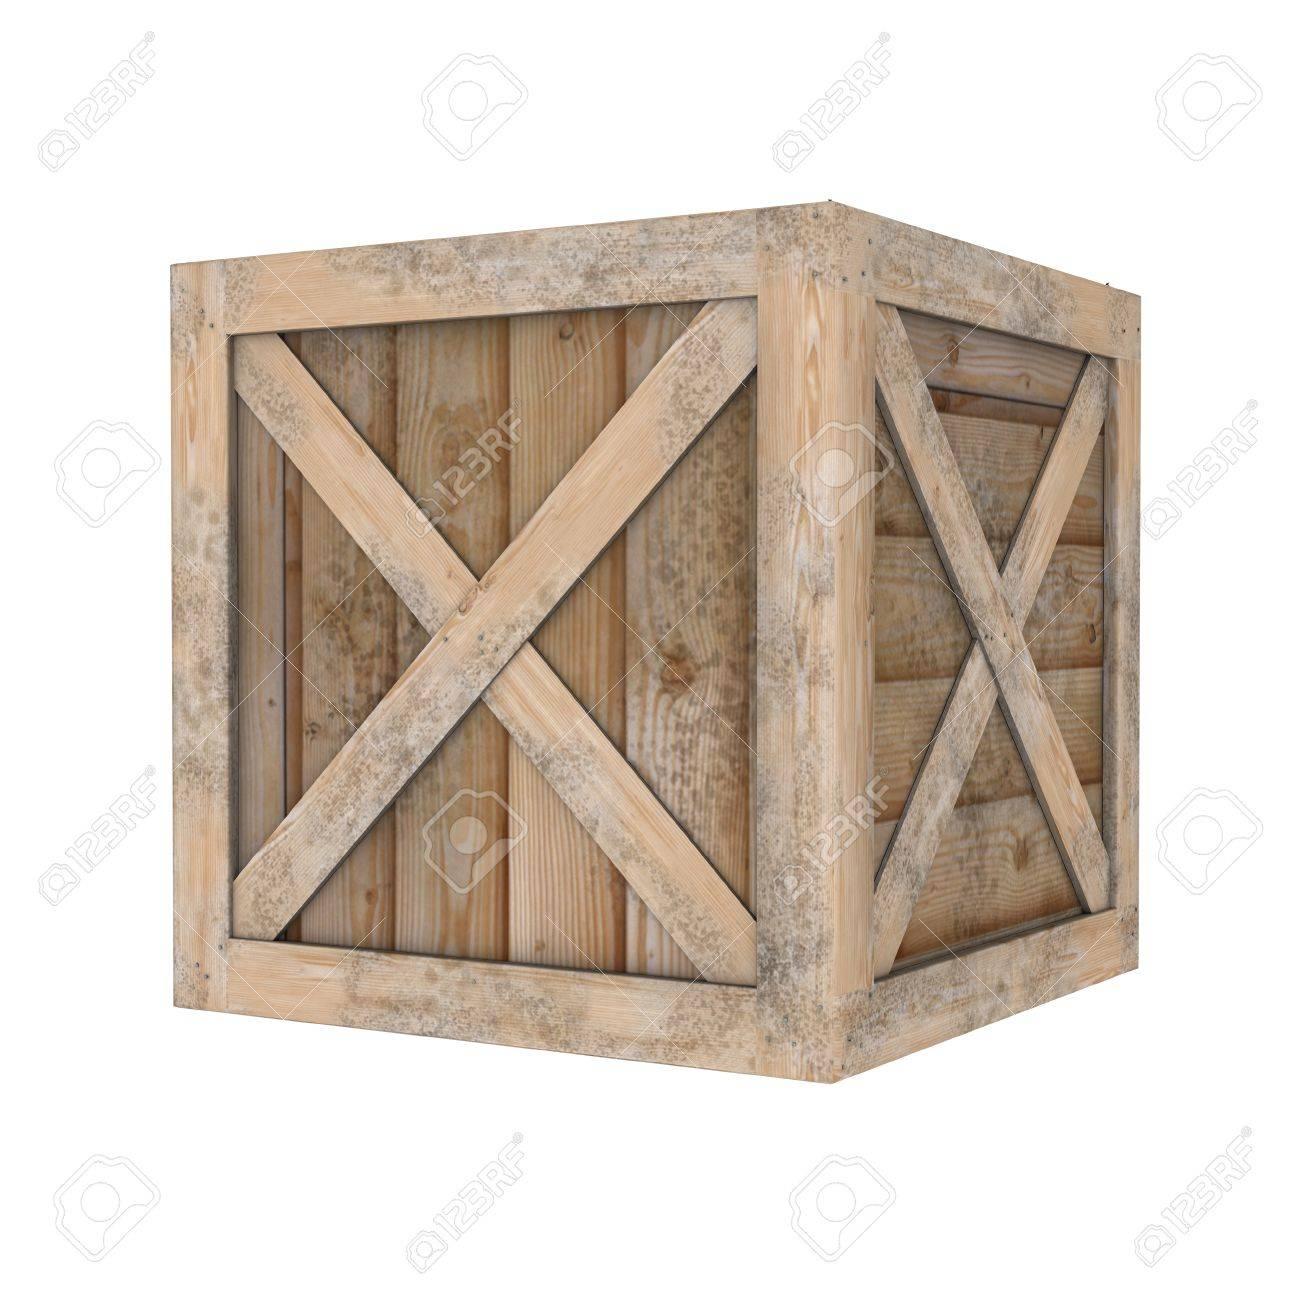 wooden box - 31374786